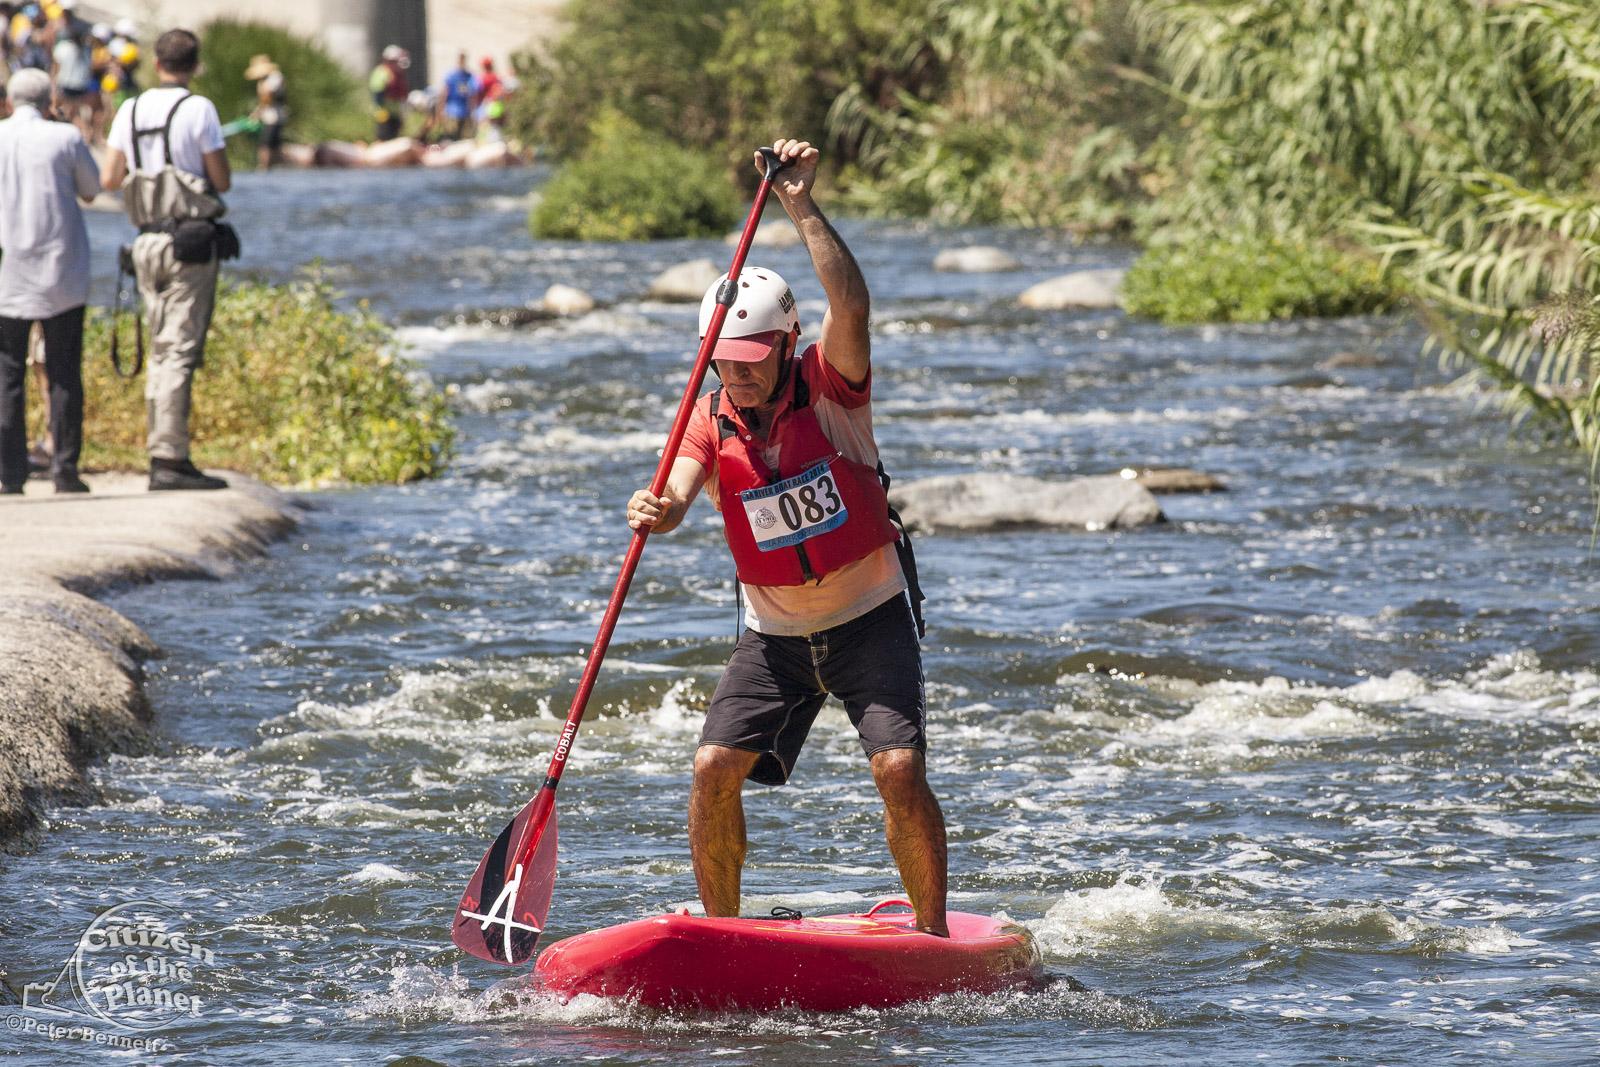 US_CA_48_3869_la_river_boat_race.jpg